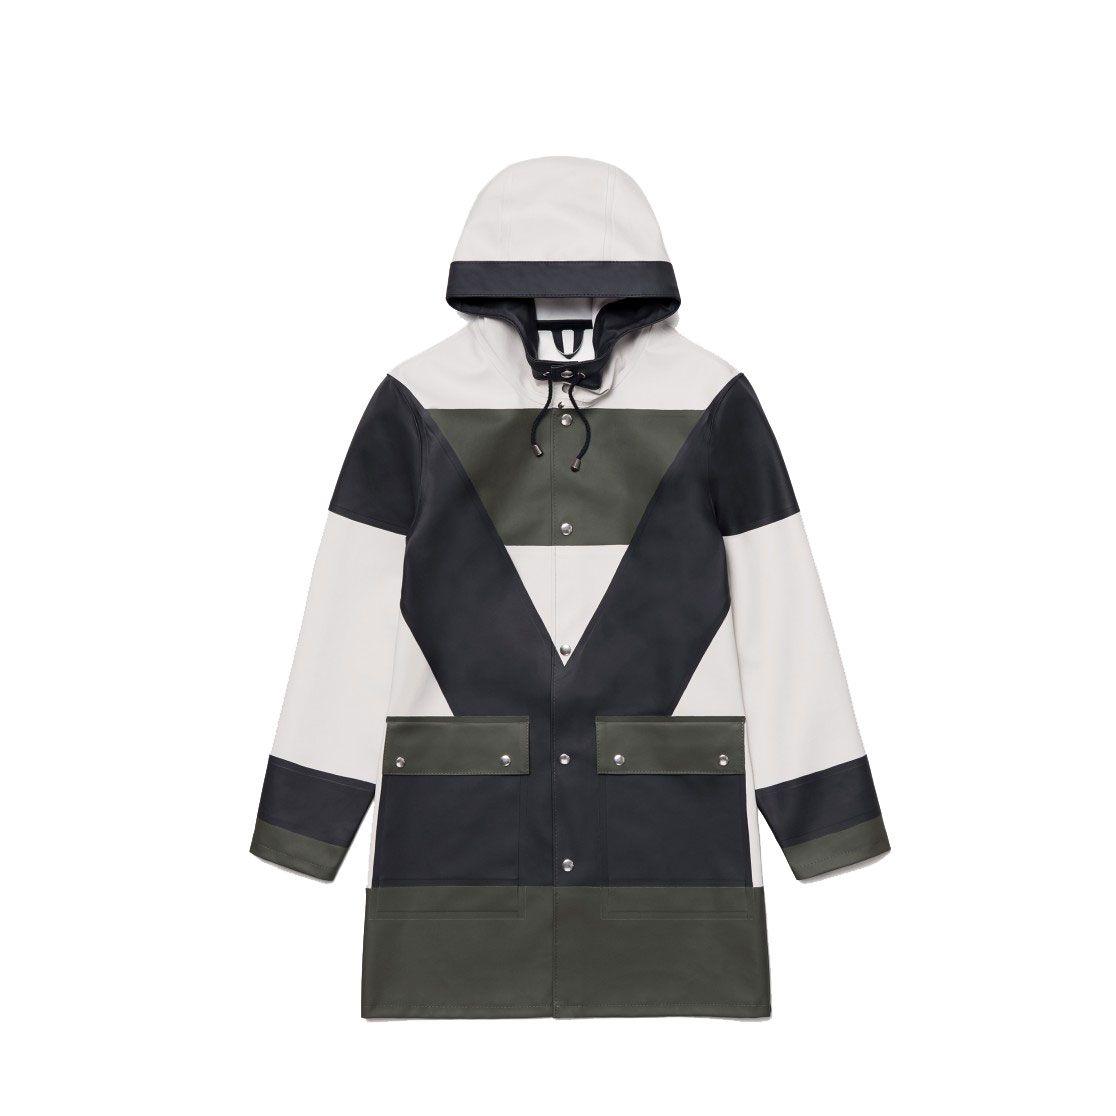 A colorblocked raincoat